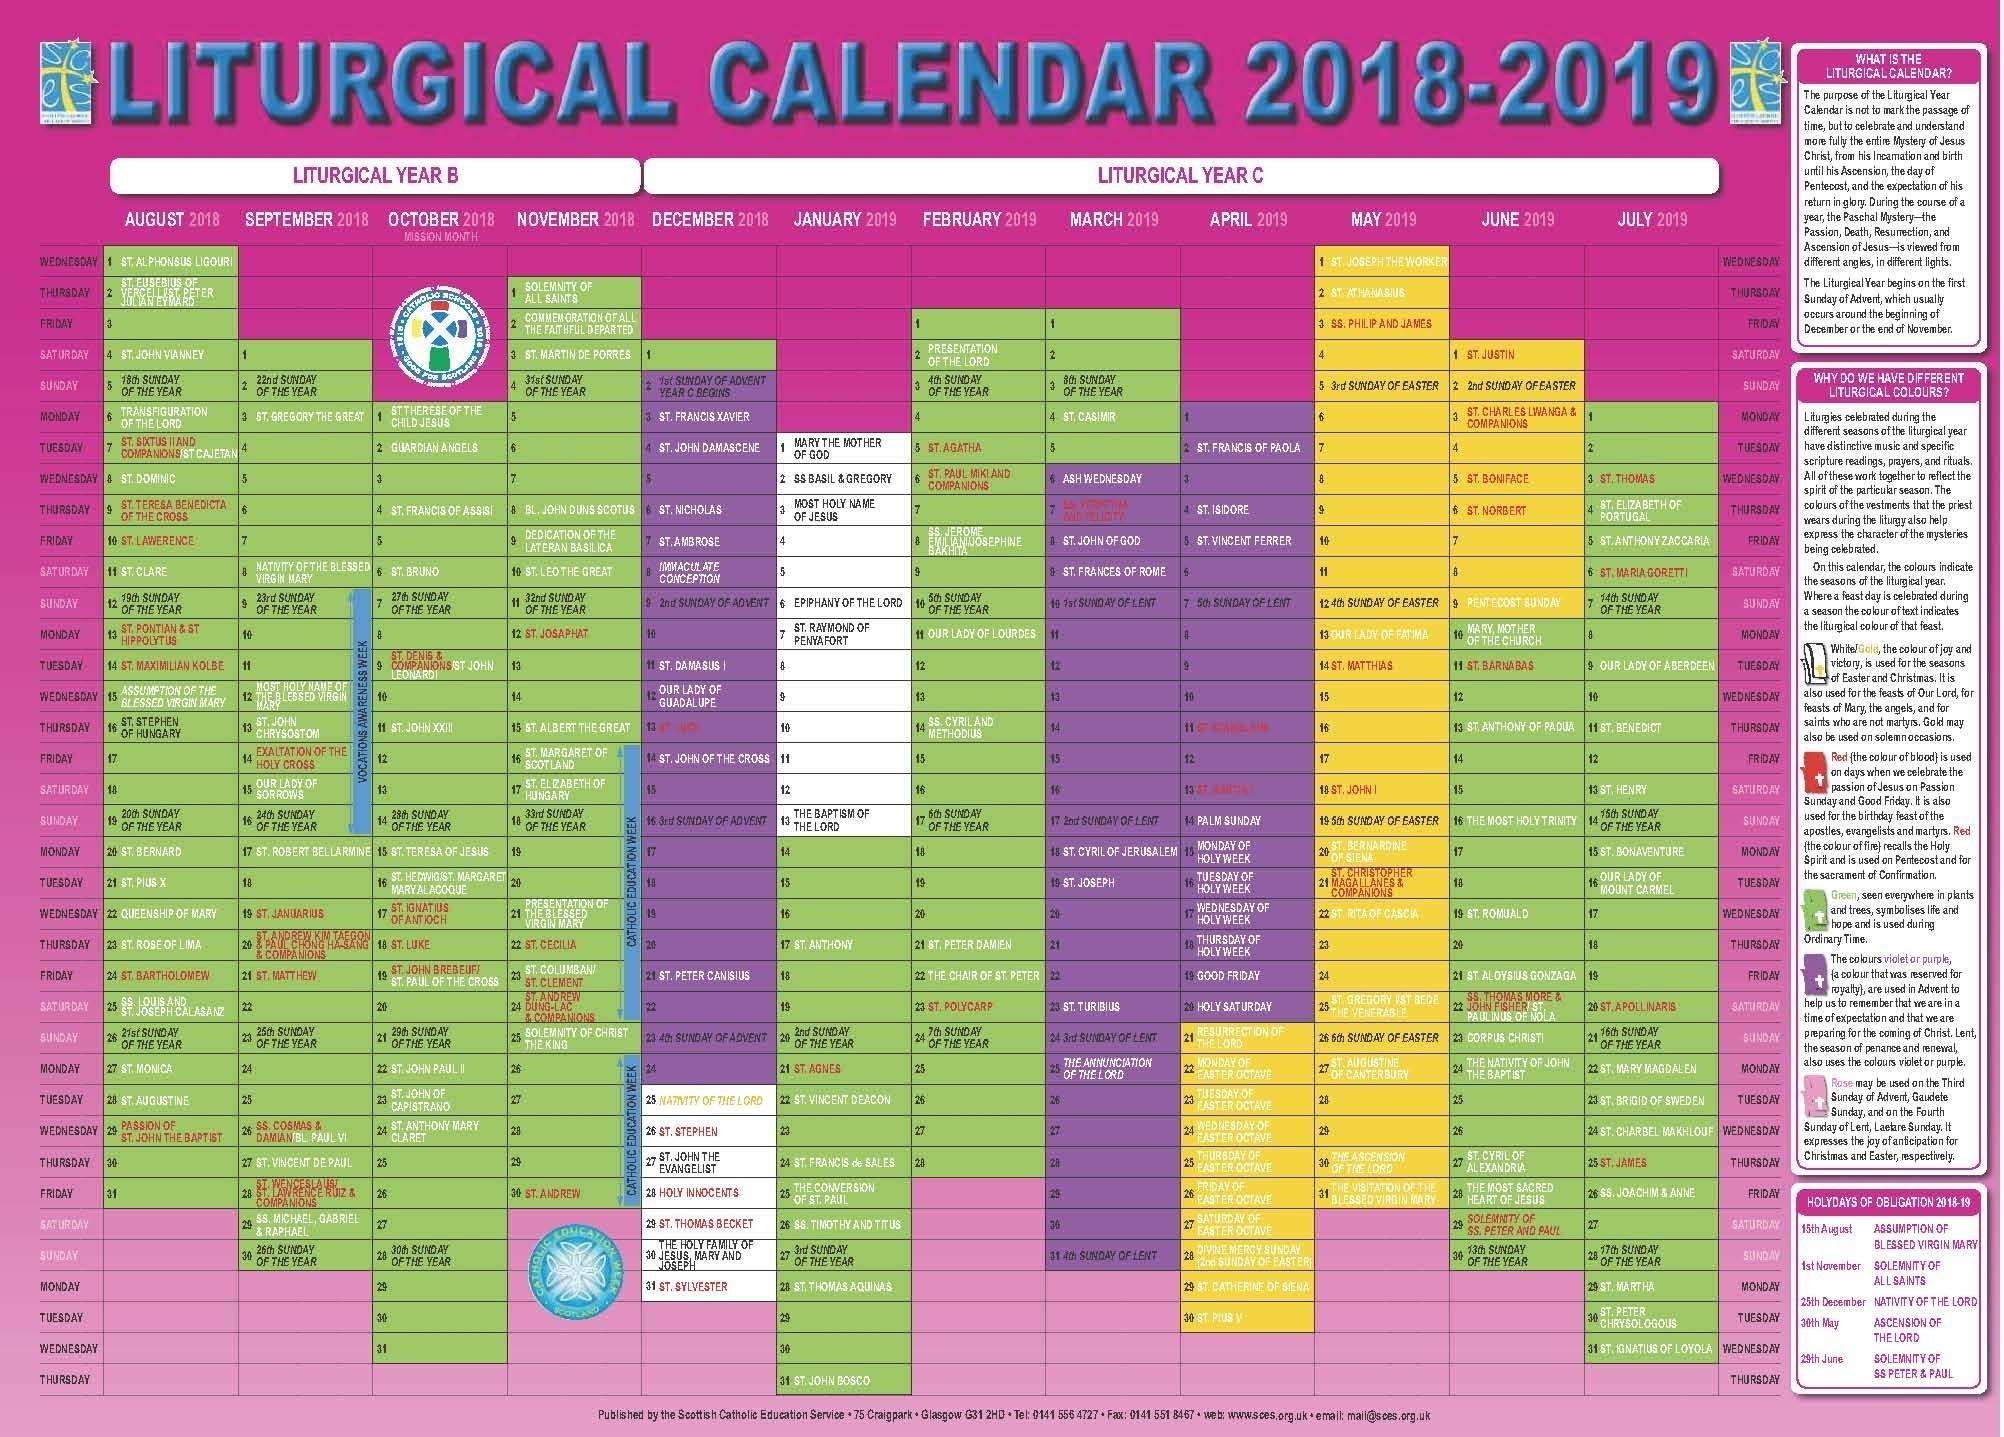 Catholic Liturgical Calendar 2020 Pdf - Calendar Inspiration regarding 2020 Liturgical Calendar With Dates